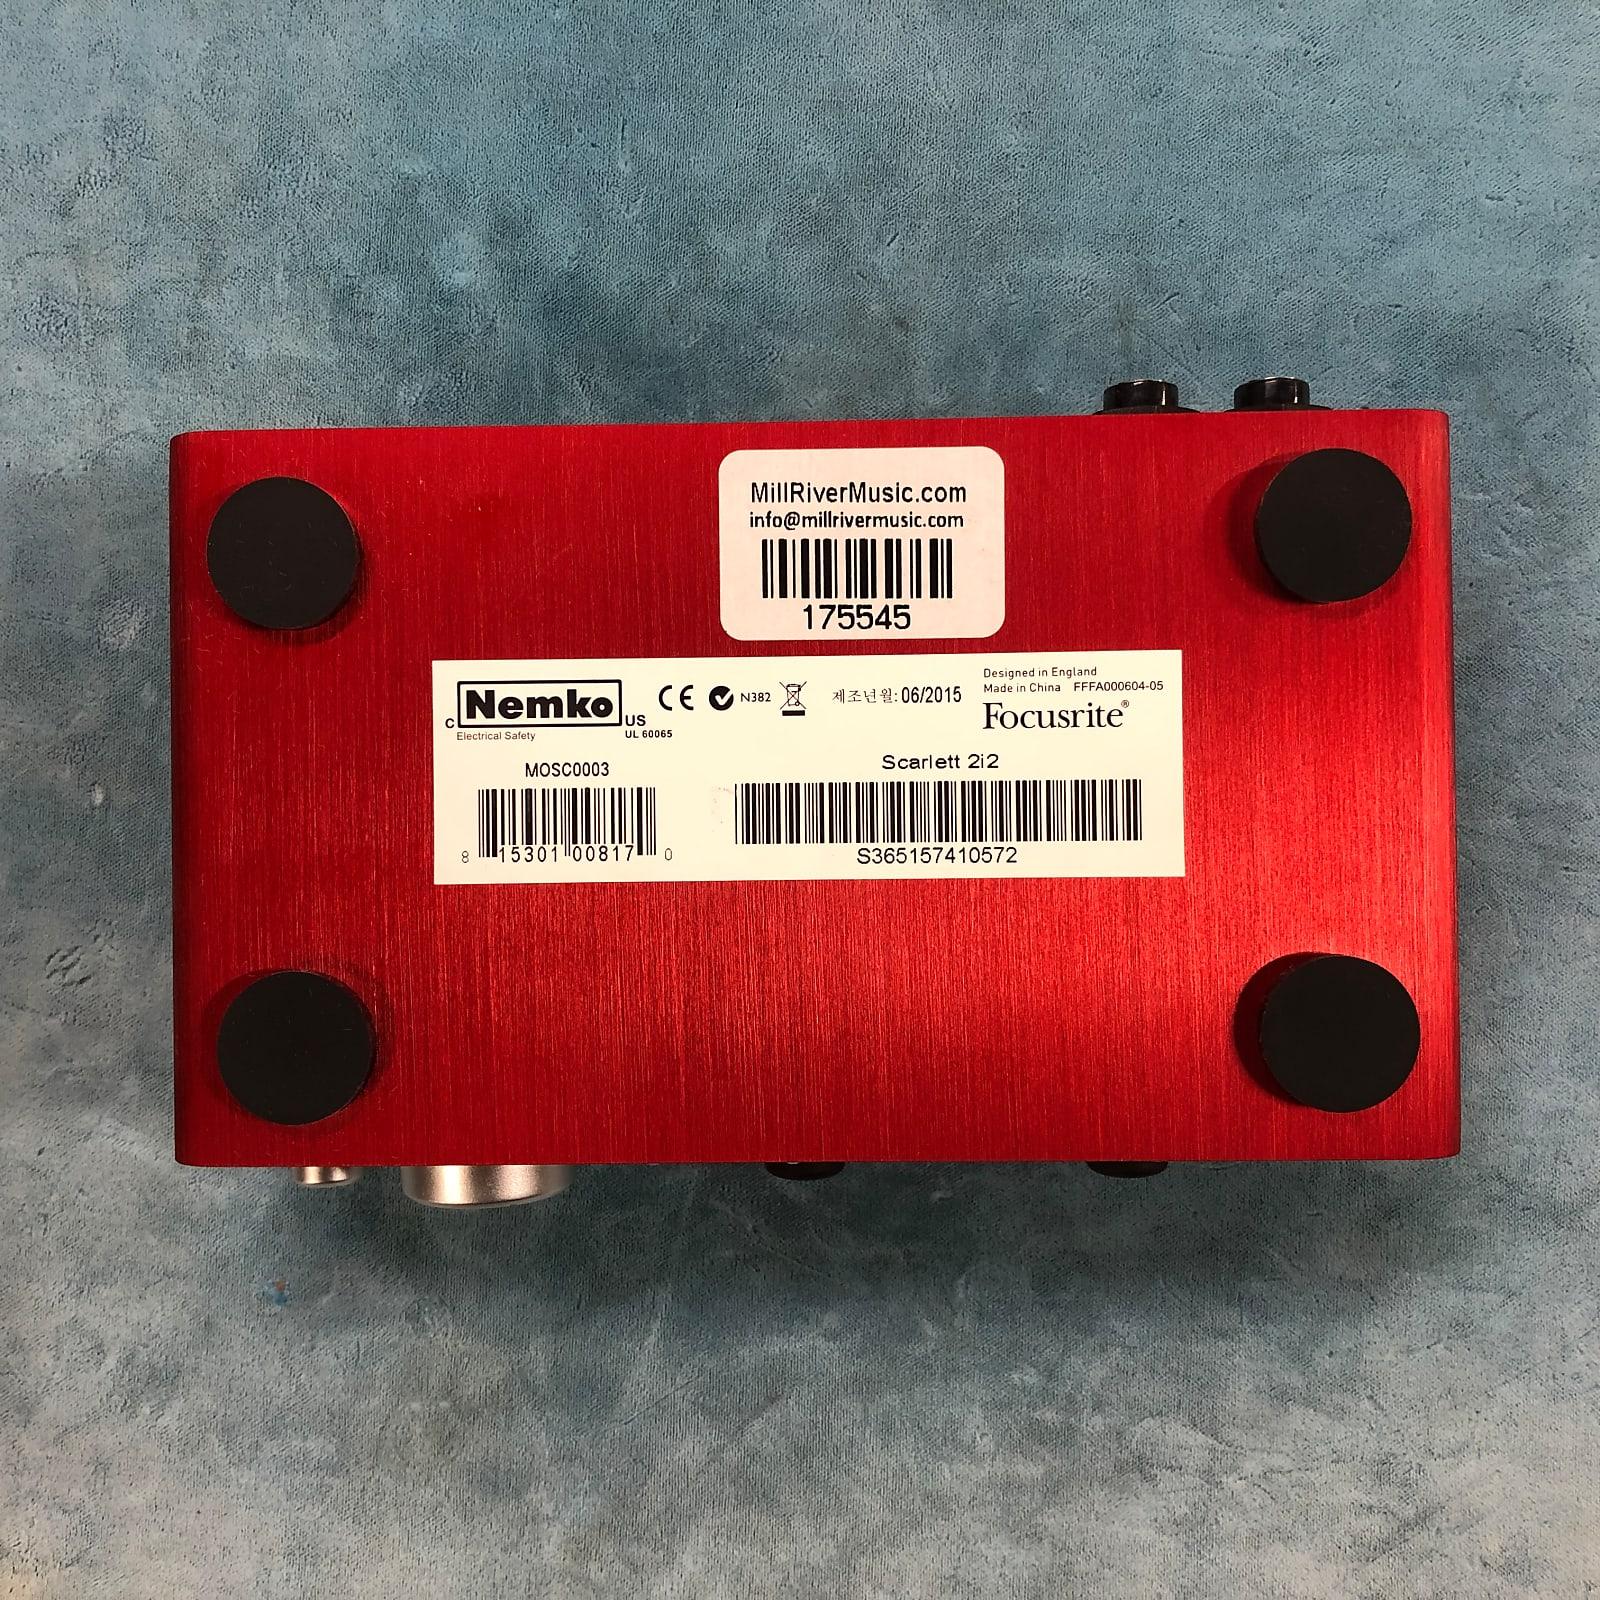 Focusrite Scarlett 2i2 USB Audio Recording Interface (1st Gen) w/ USB Cable